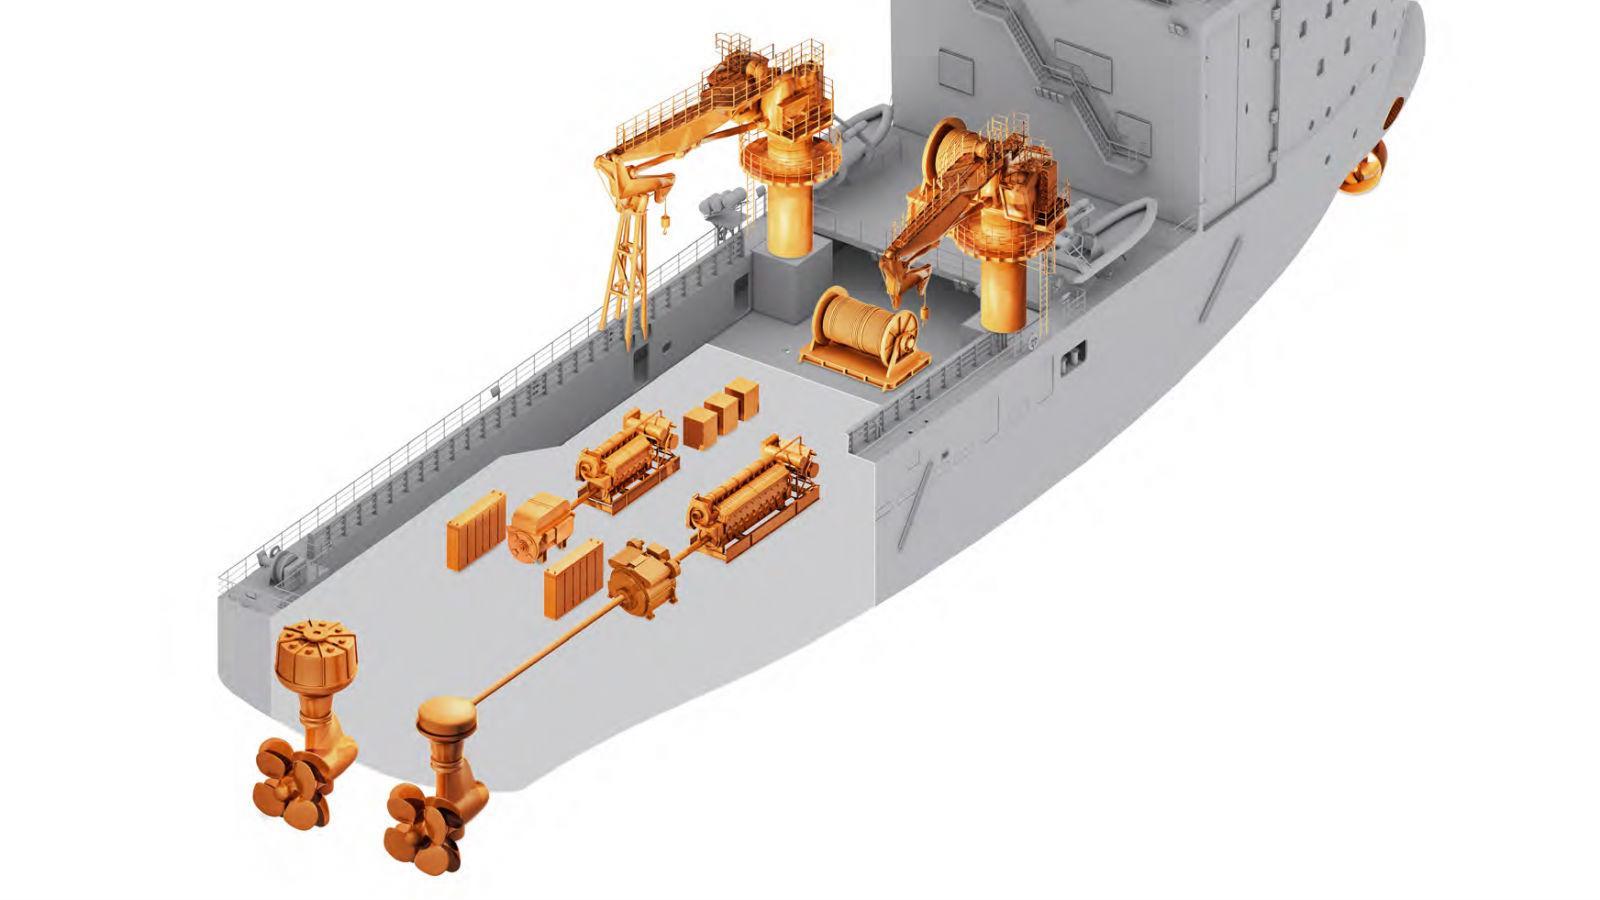 Green Shipping Needs An Efficient Power System